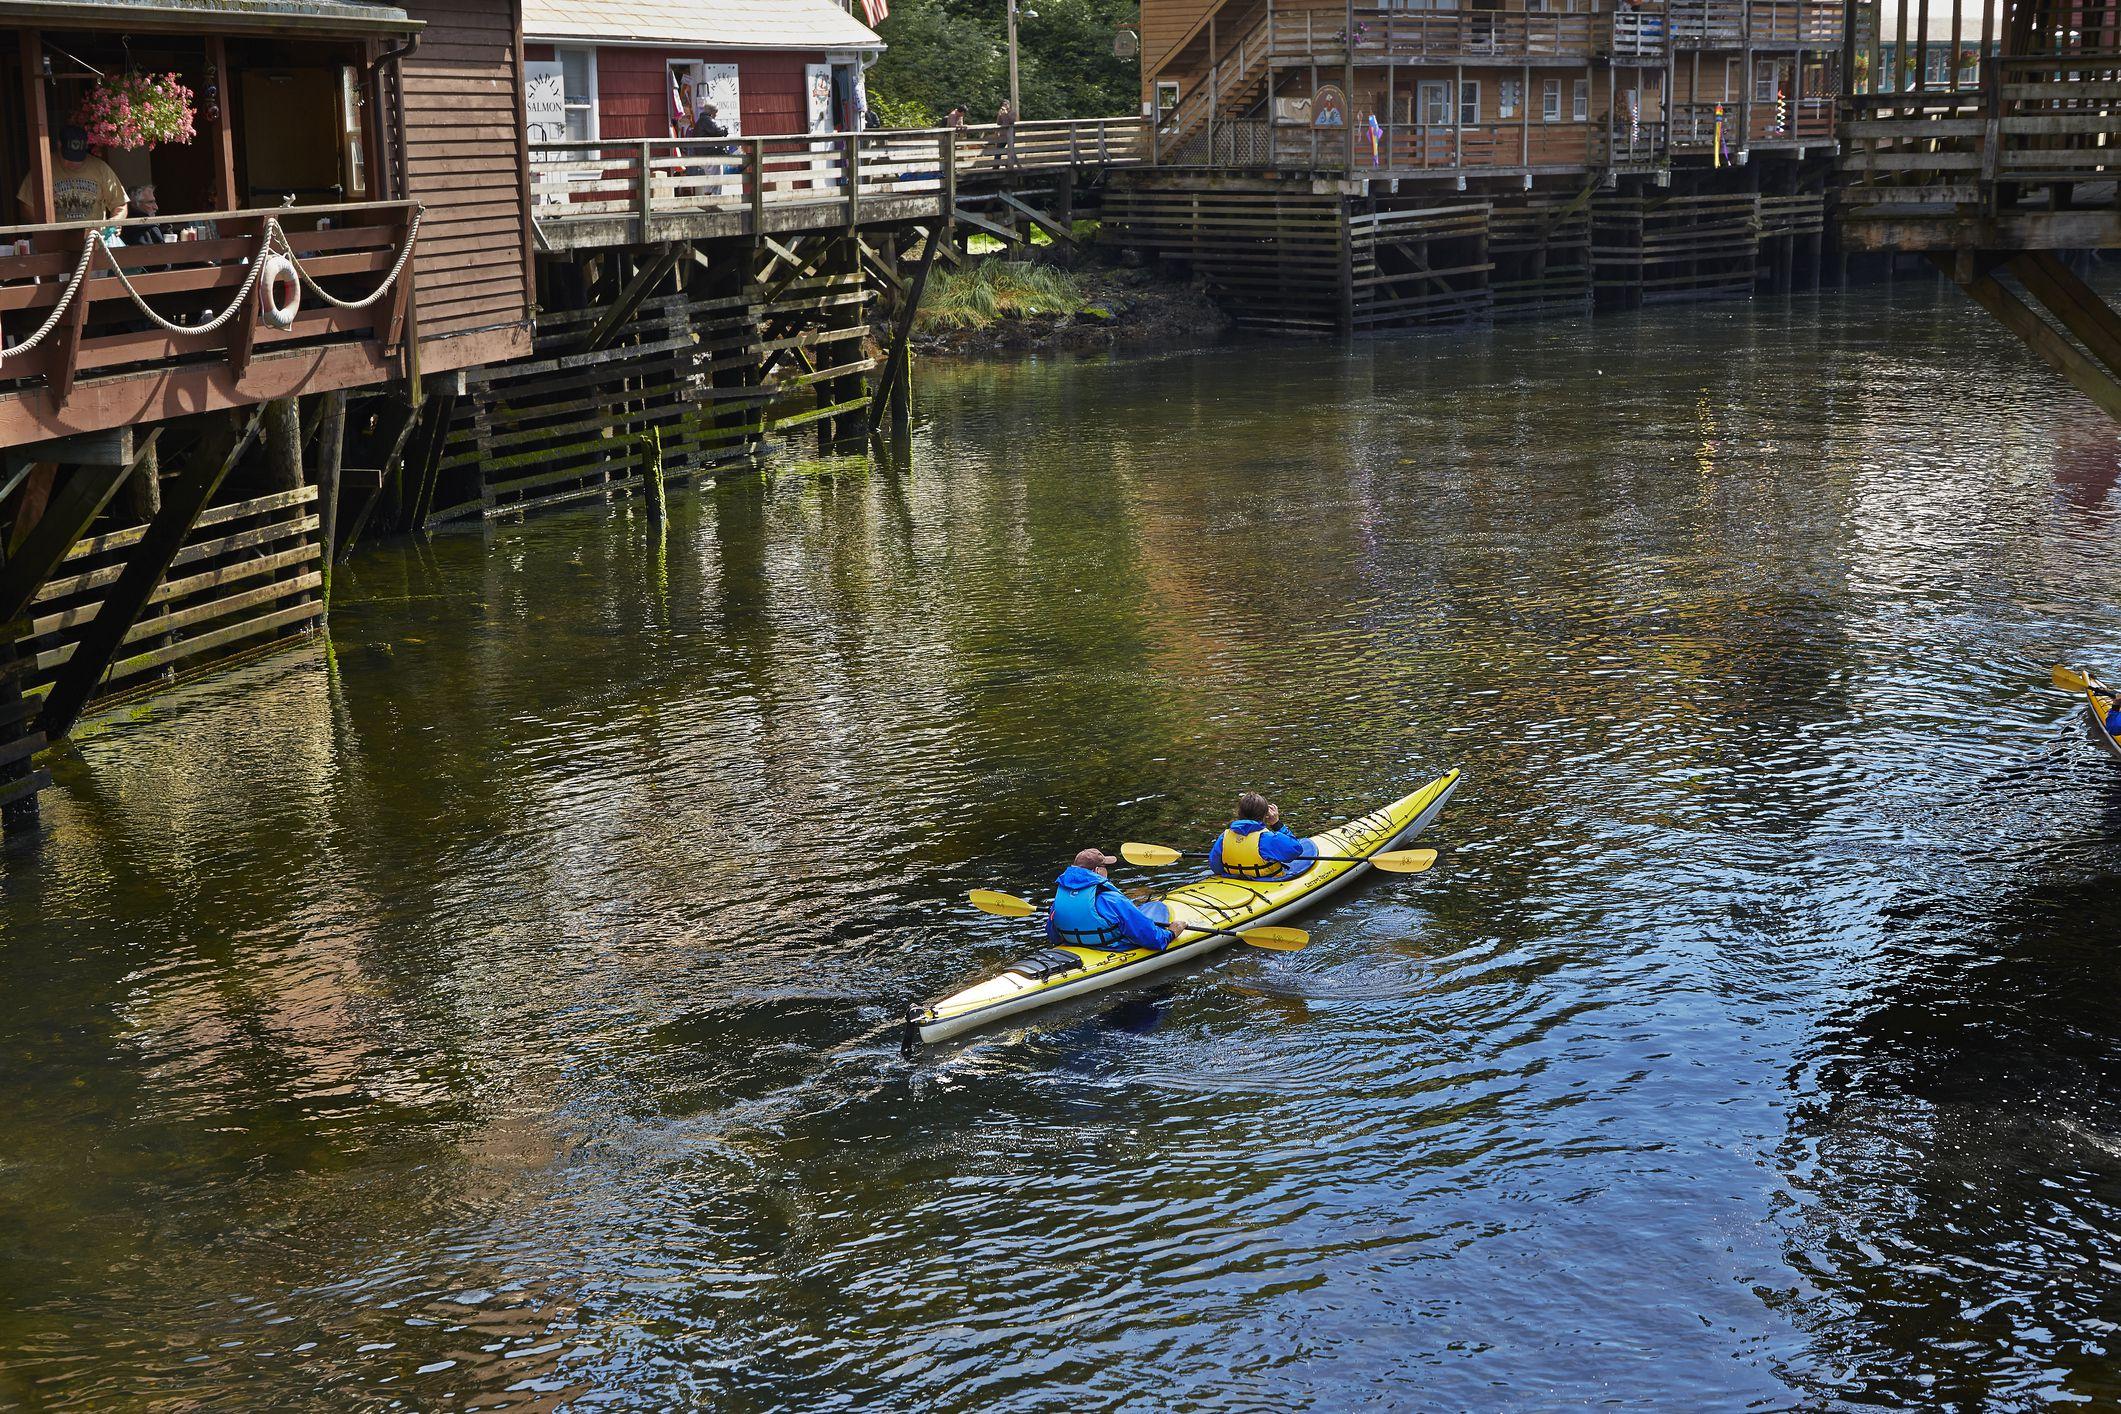 Two kayakers enjoy the sights of Ketchikan's historic Creek Street by paddling the Ketchikan Creek.